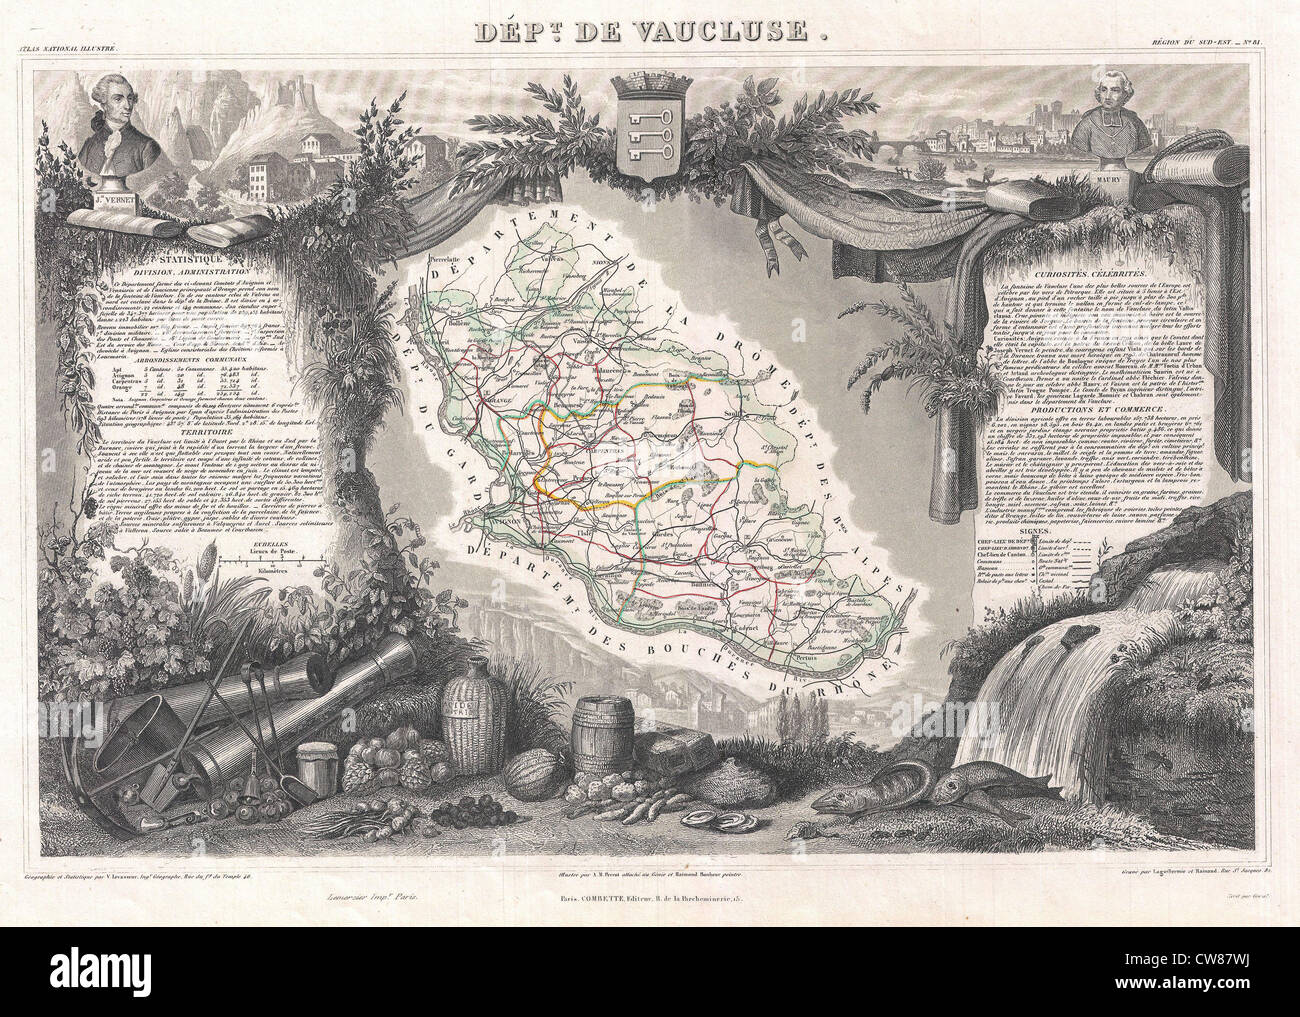 1852 Levasseur Map of the Department De Vaucluse, France - Stock Image